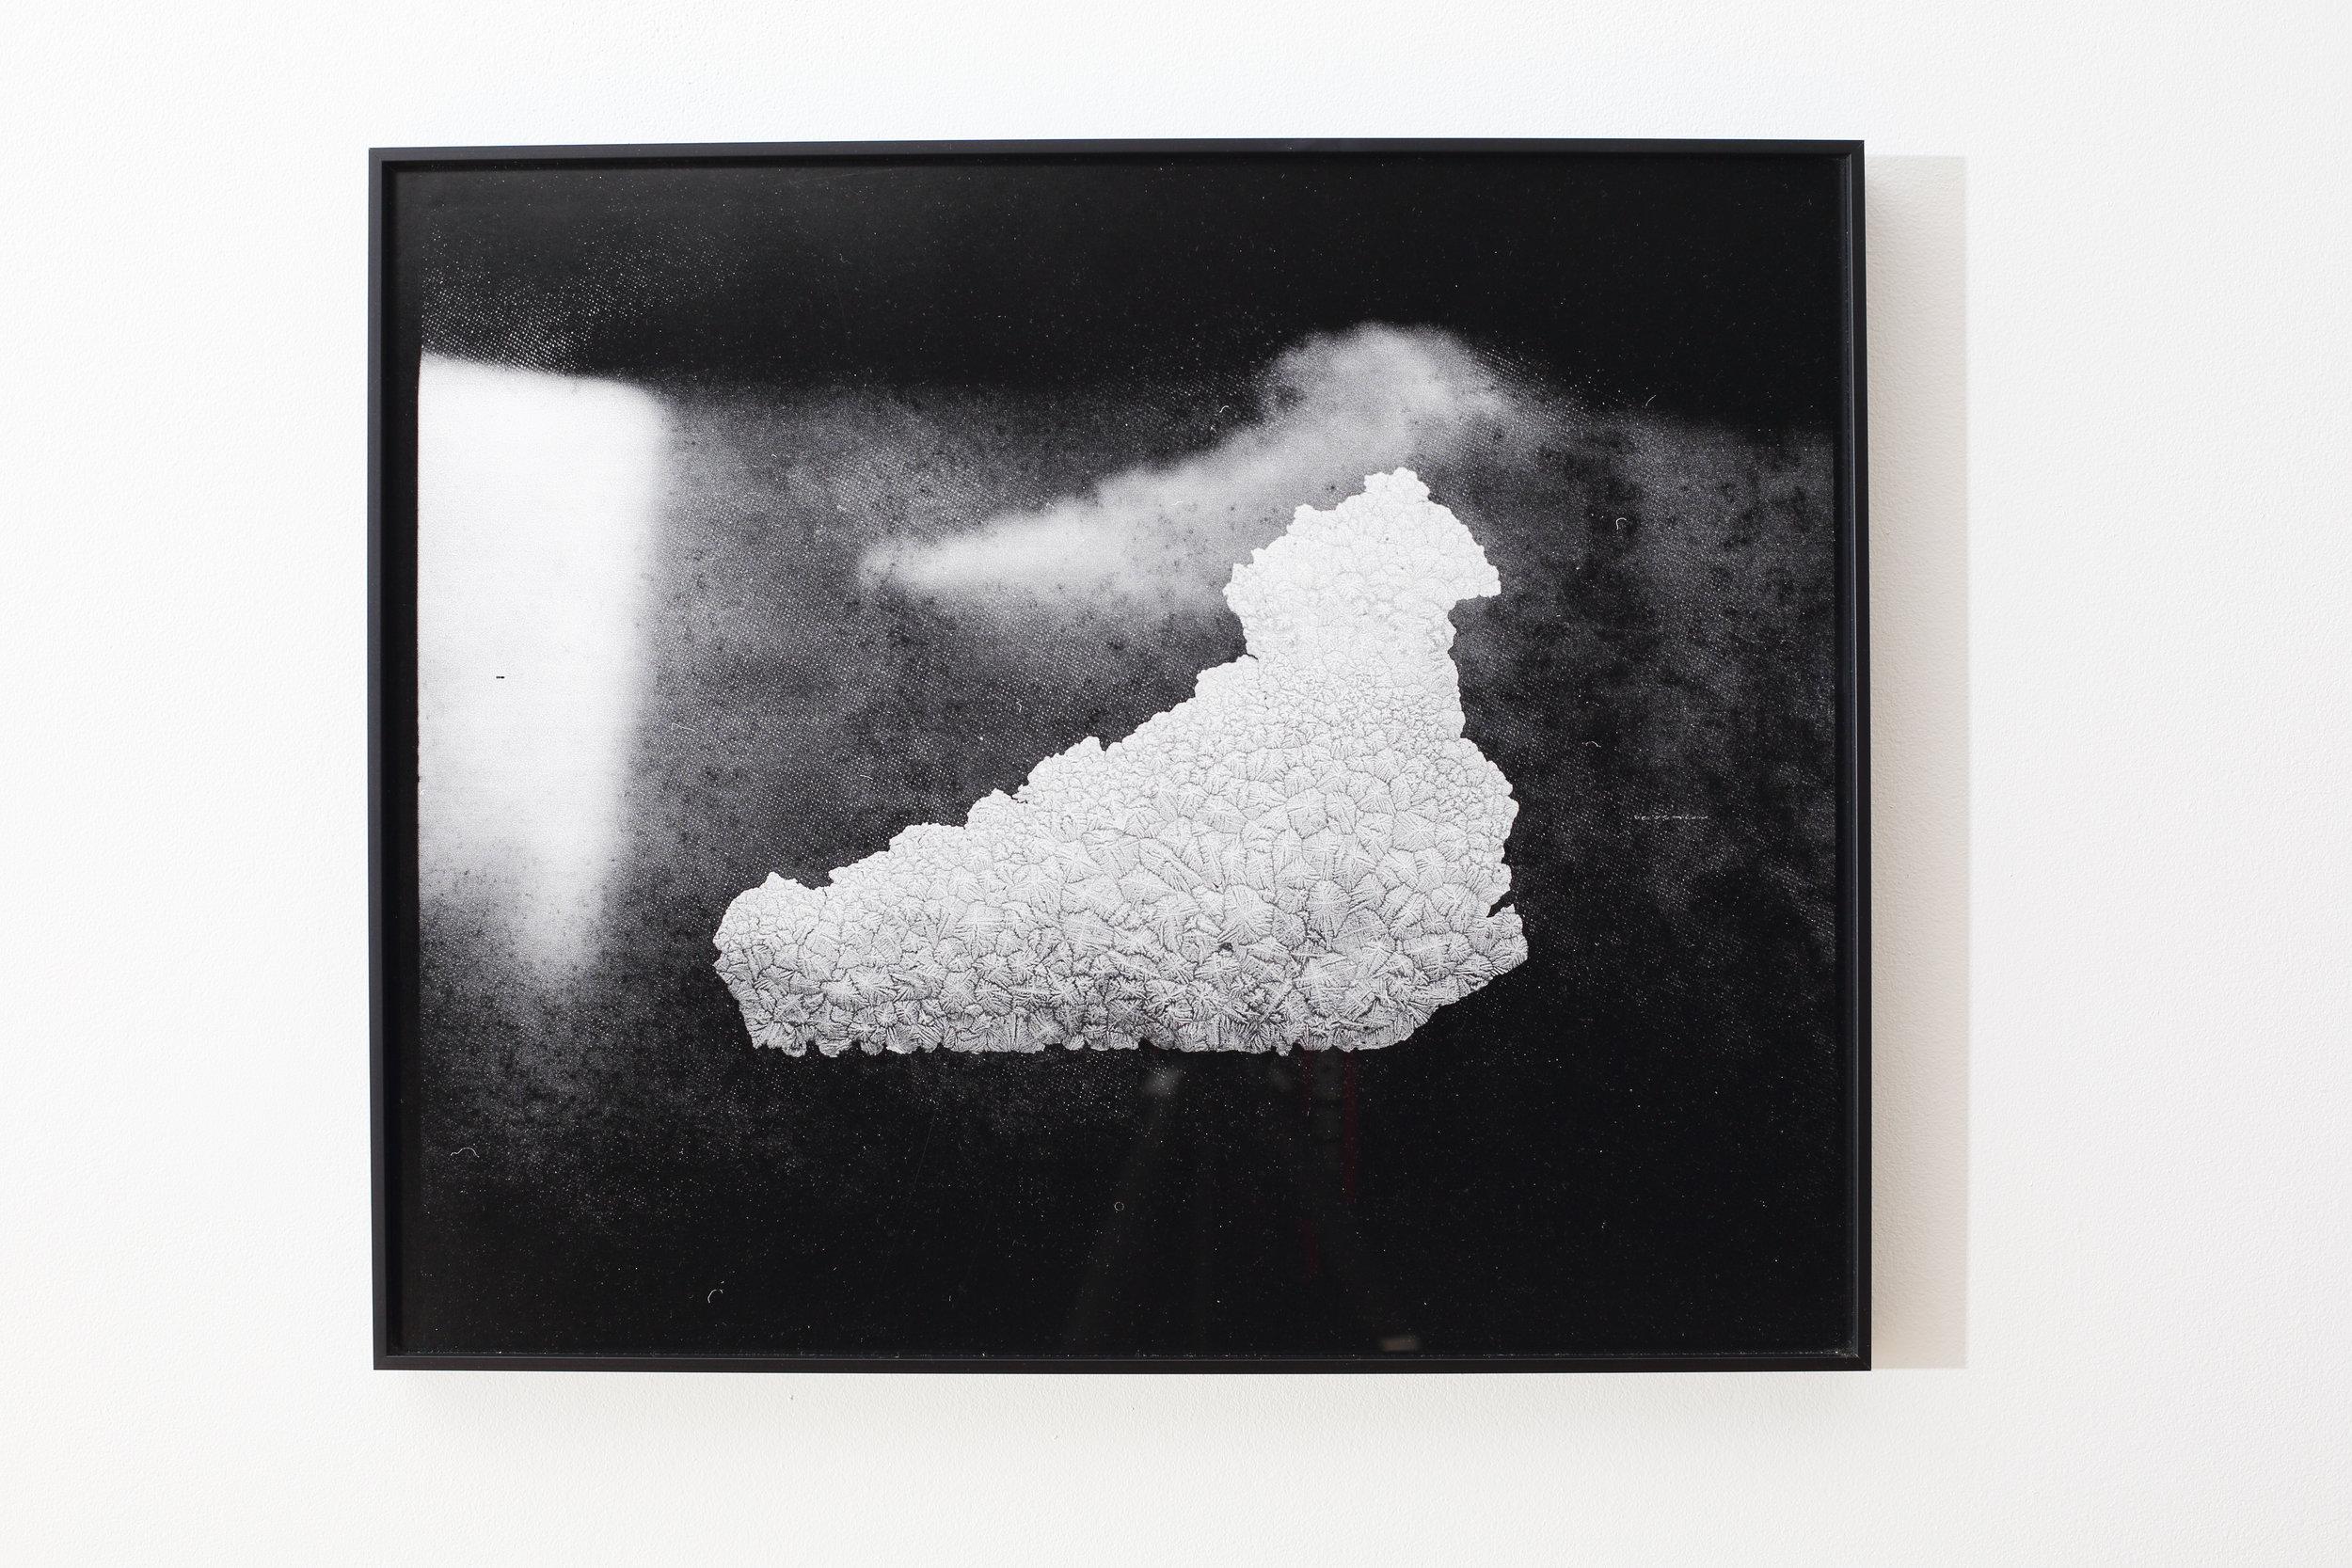 Julie Escoffier ,  Mishap_4 Rice Water Overflow , 2016, medium-format film printed on silk Baryta